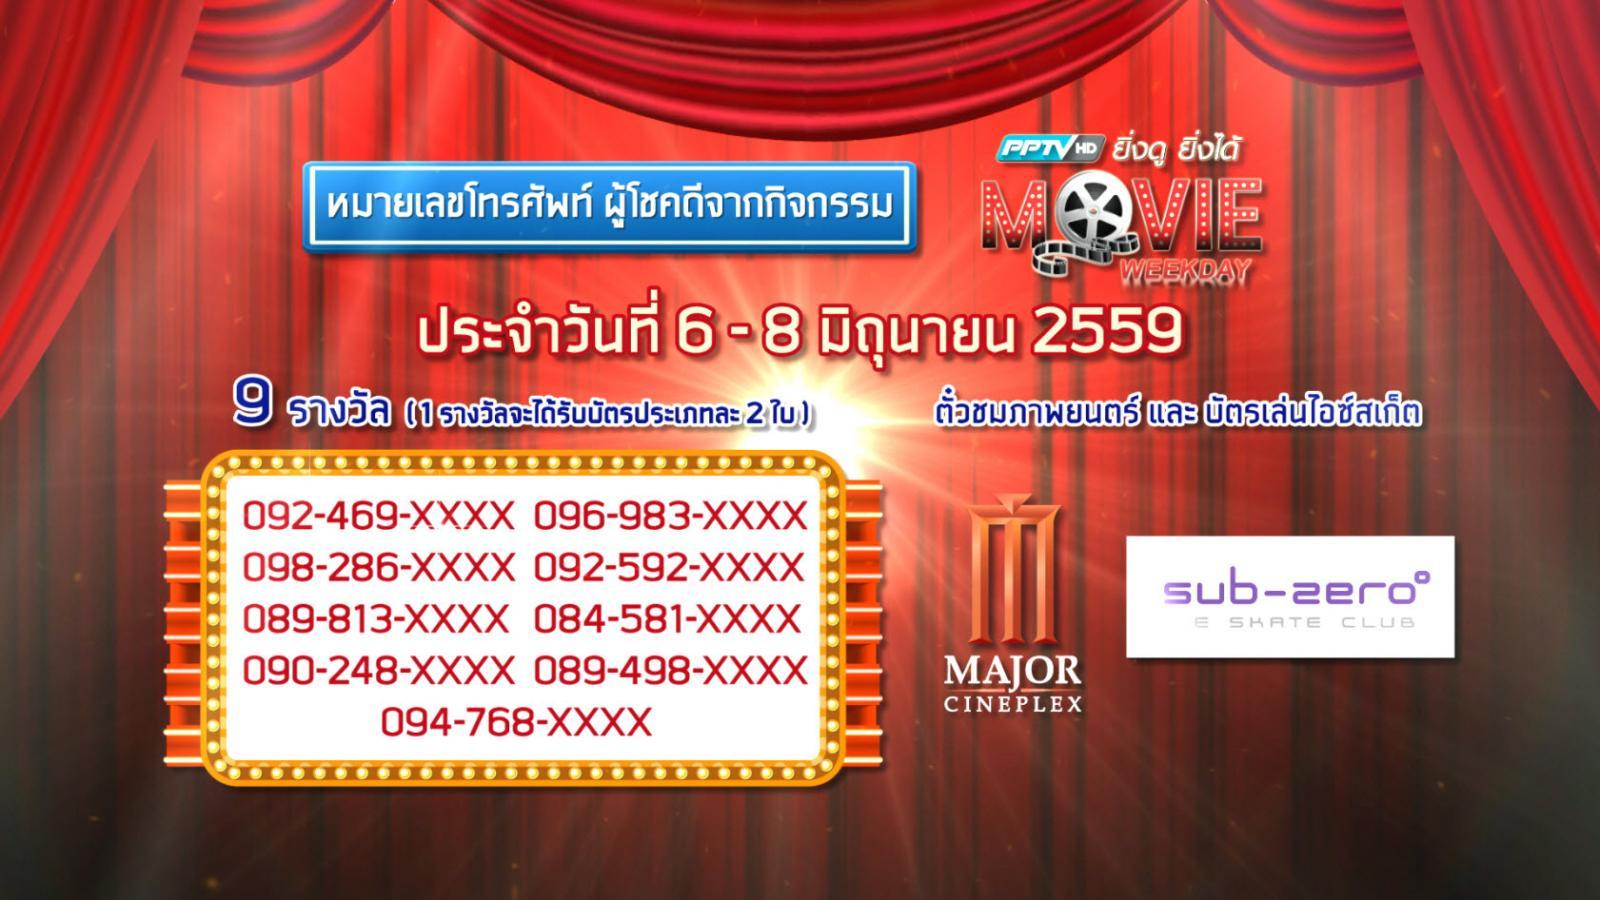 [Movie Weekday] ประกาศหมายเลขผู้โชคดี กิจกรรมประจำวันที่ 6-8 มิถุนายน 2559